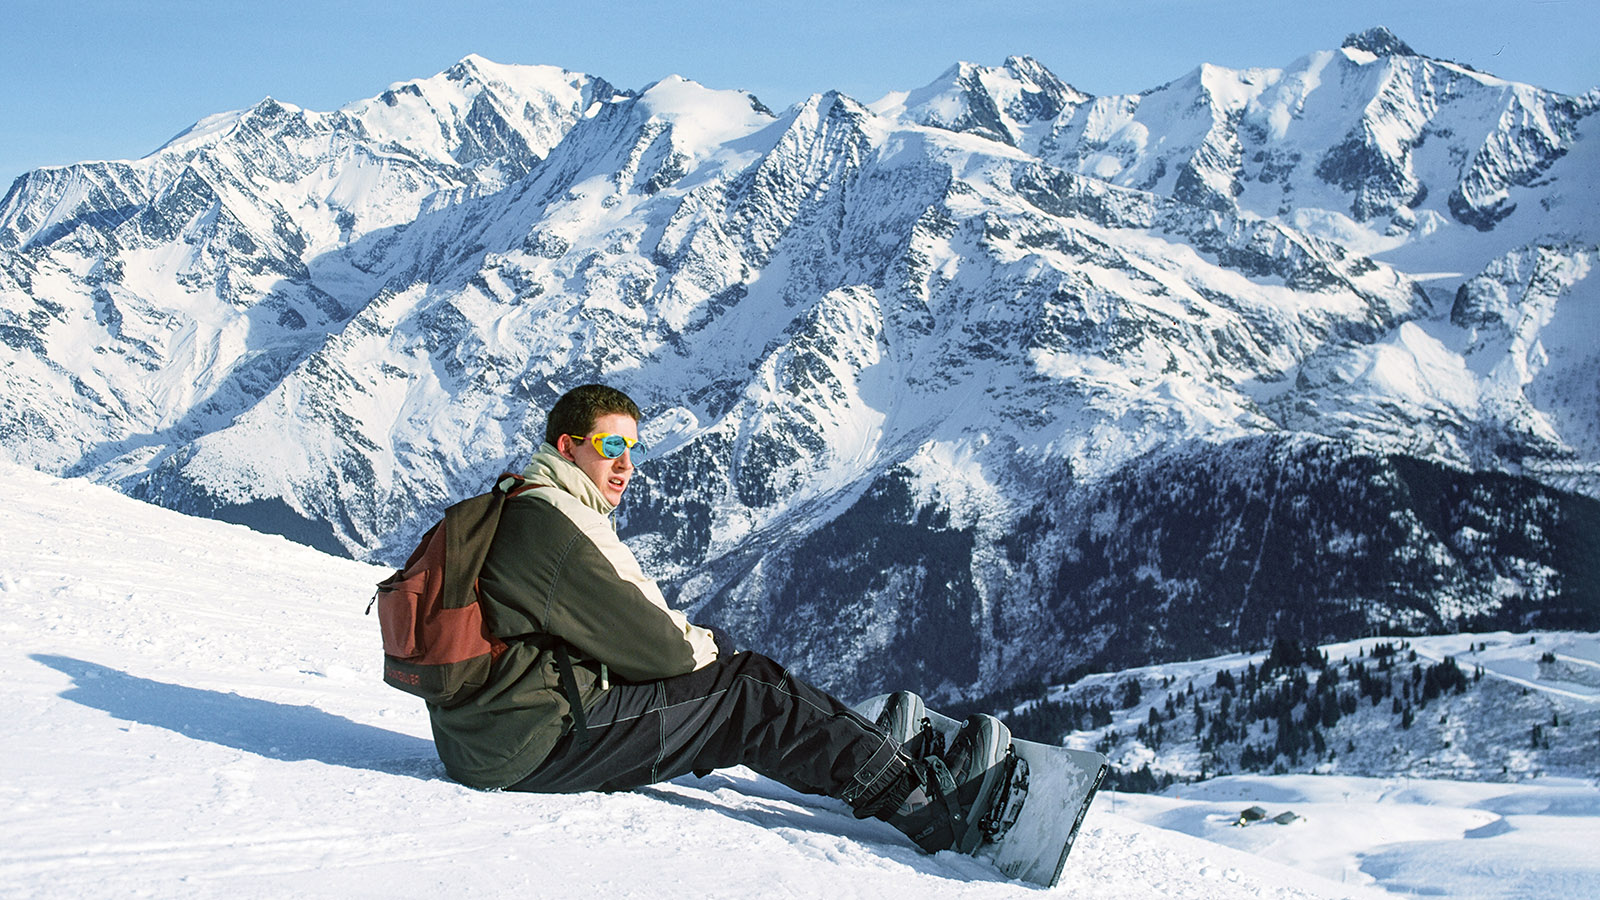 Les Contamines-Montjoie: Abfahrt mit Blick auf Mont Blanc. Foto: Hilke Maunder